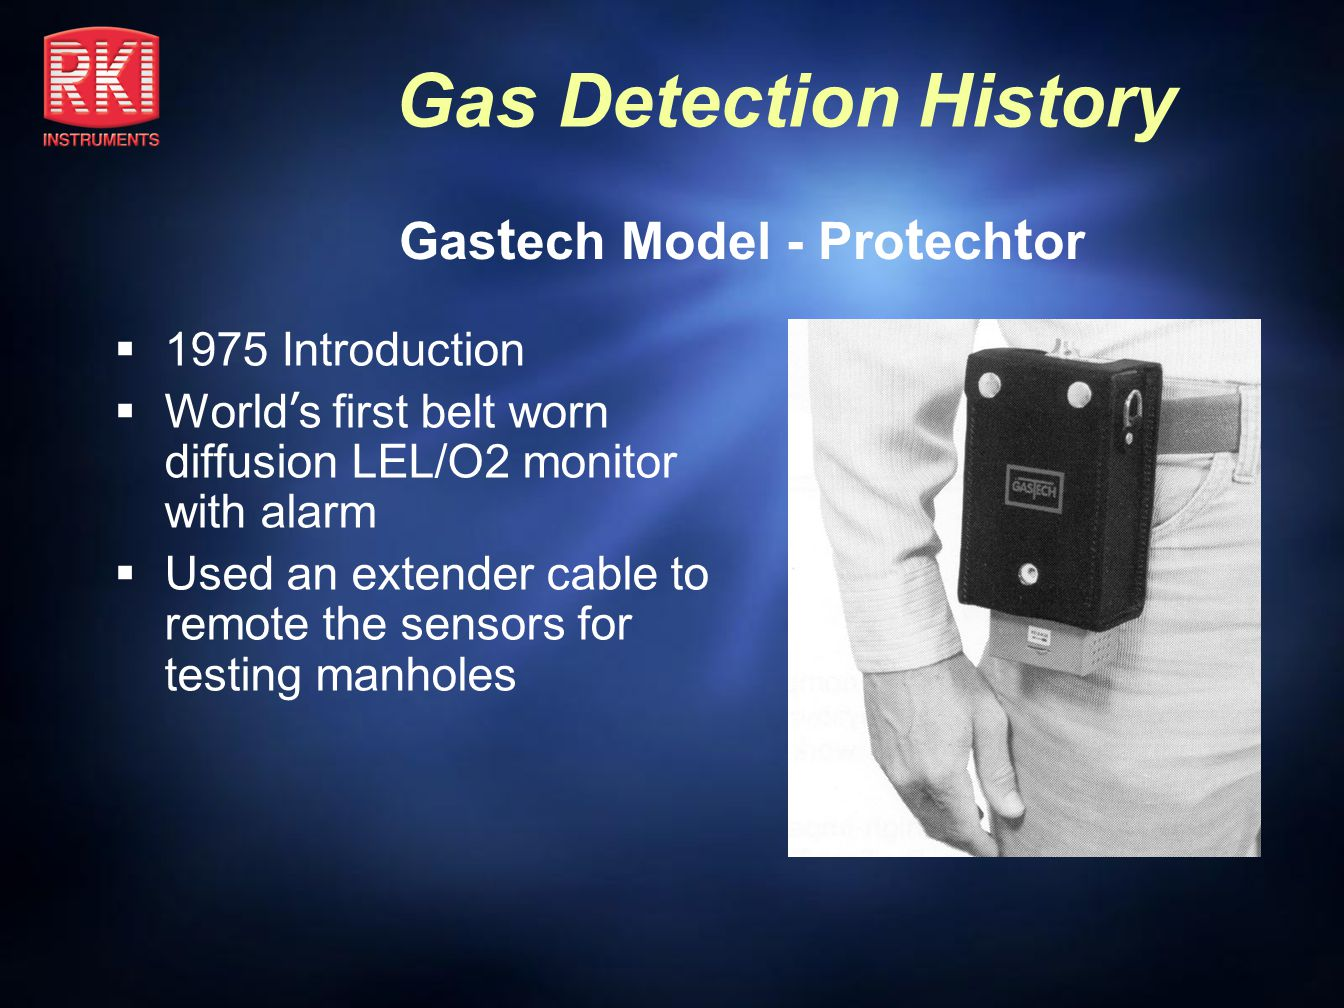 Gastech Model - Protechtor